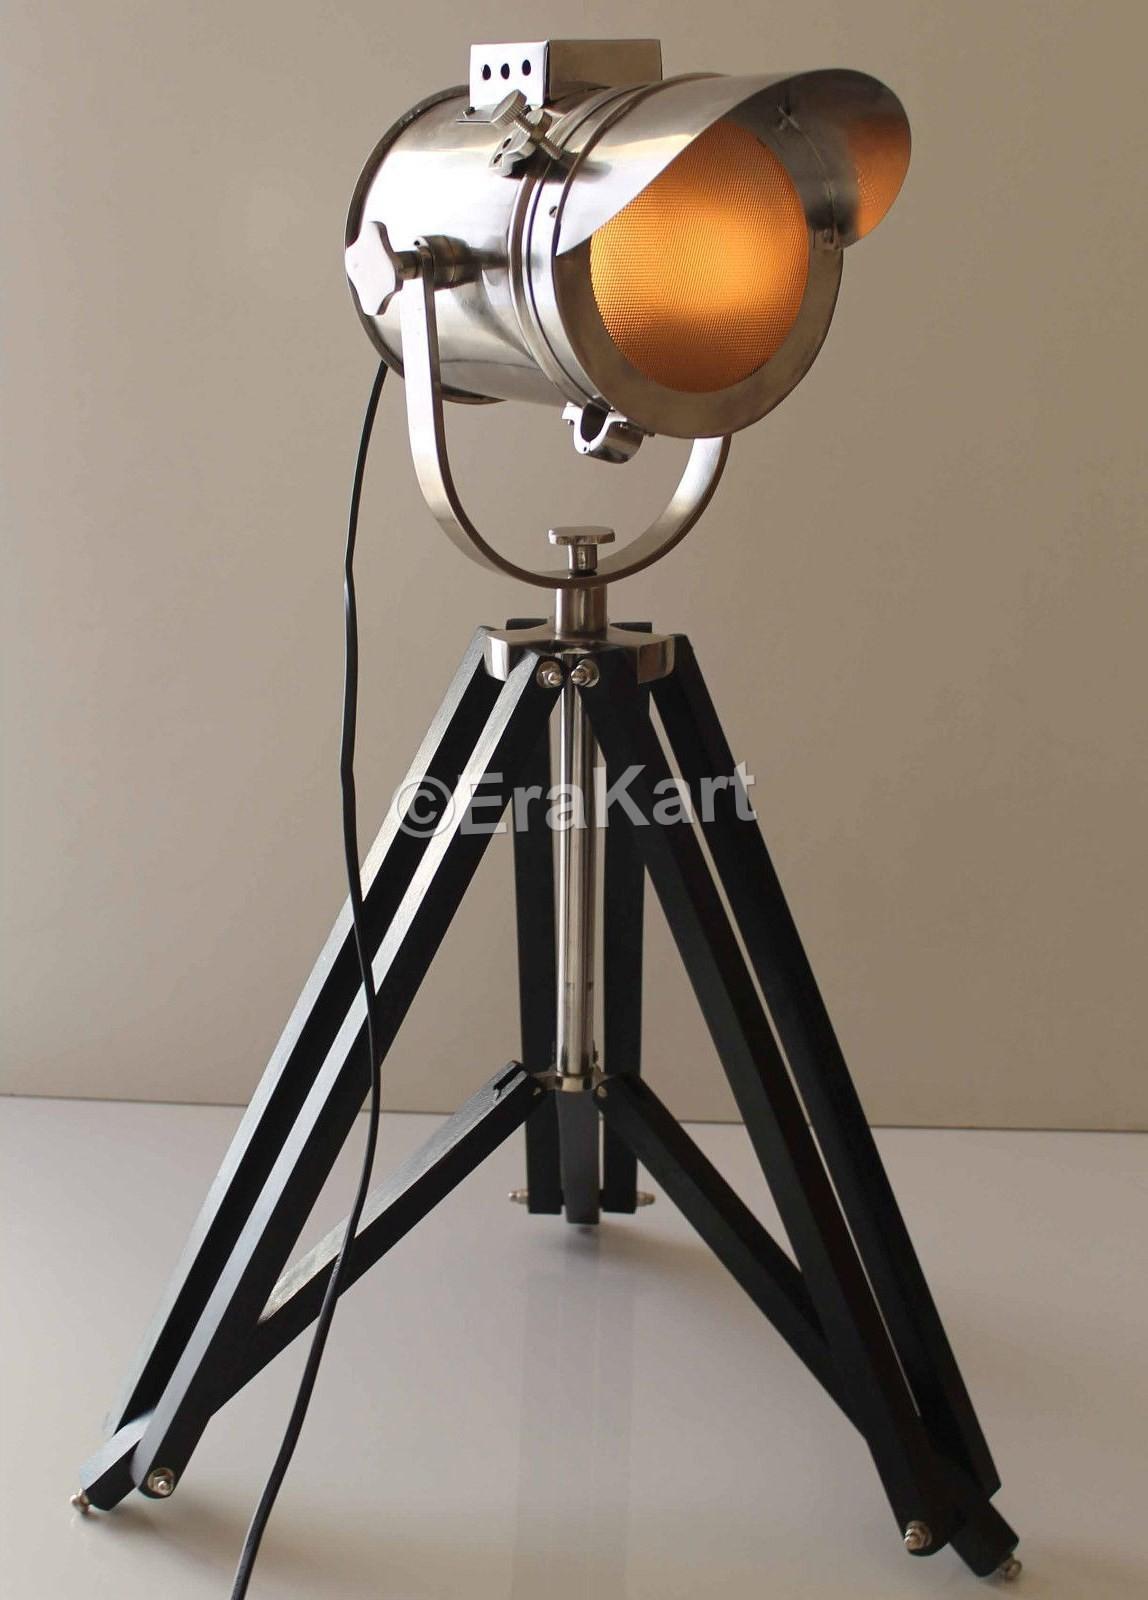 Royal master sealight floor lamp - Vintage Cap Style Nautical Spotlight Antique Floor Lamp